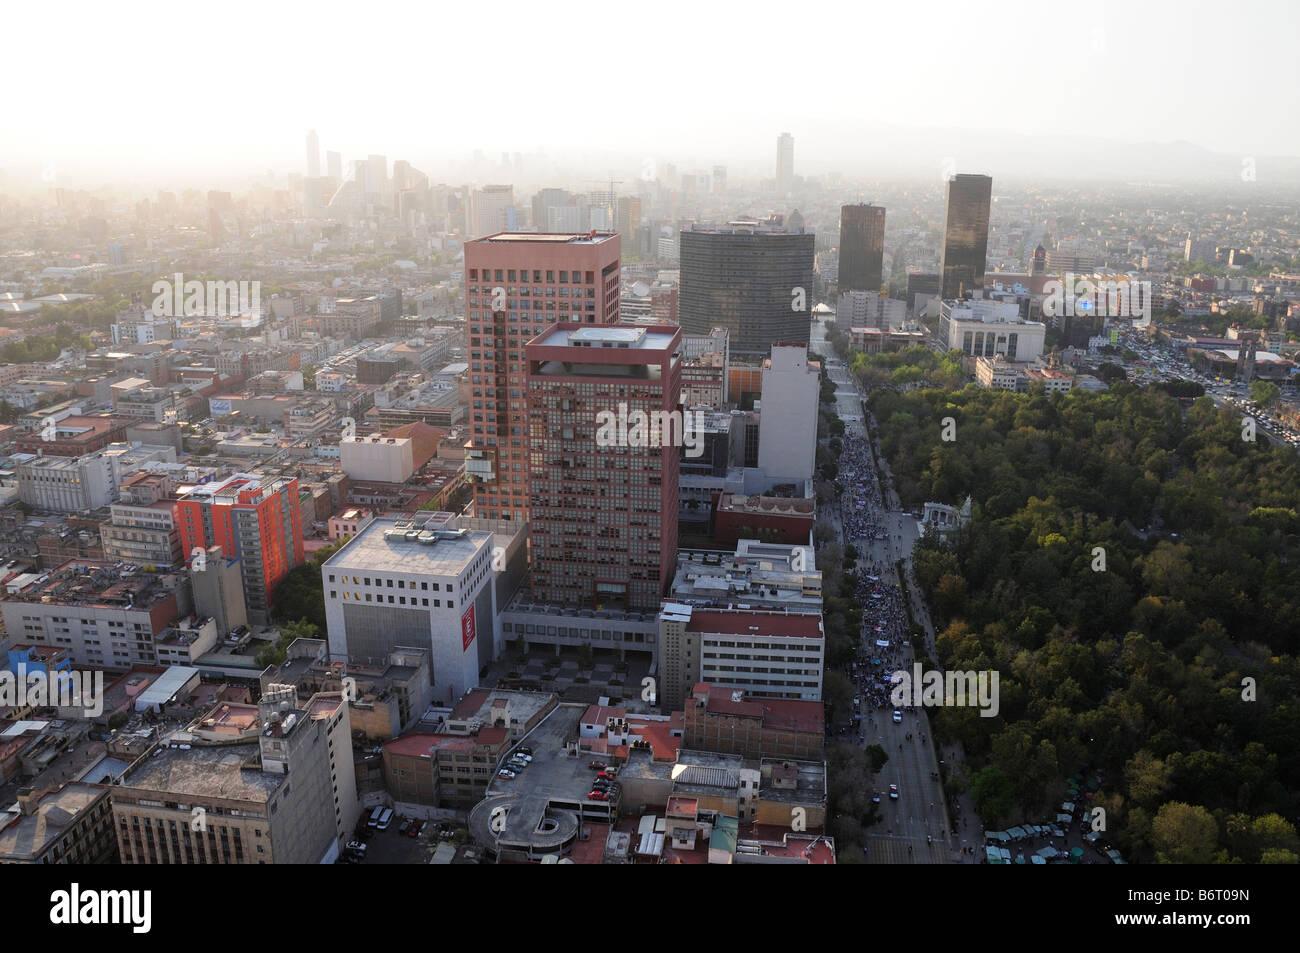 Skyline of Mexico City - Stock Image